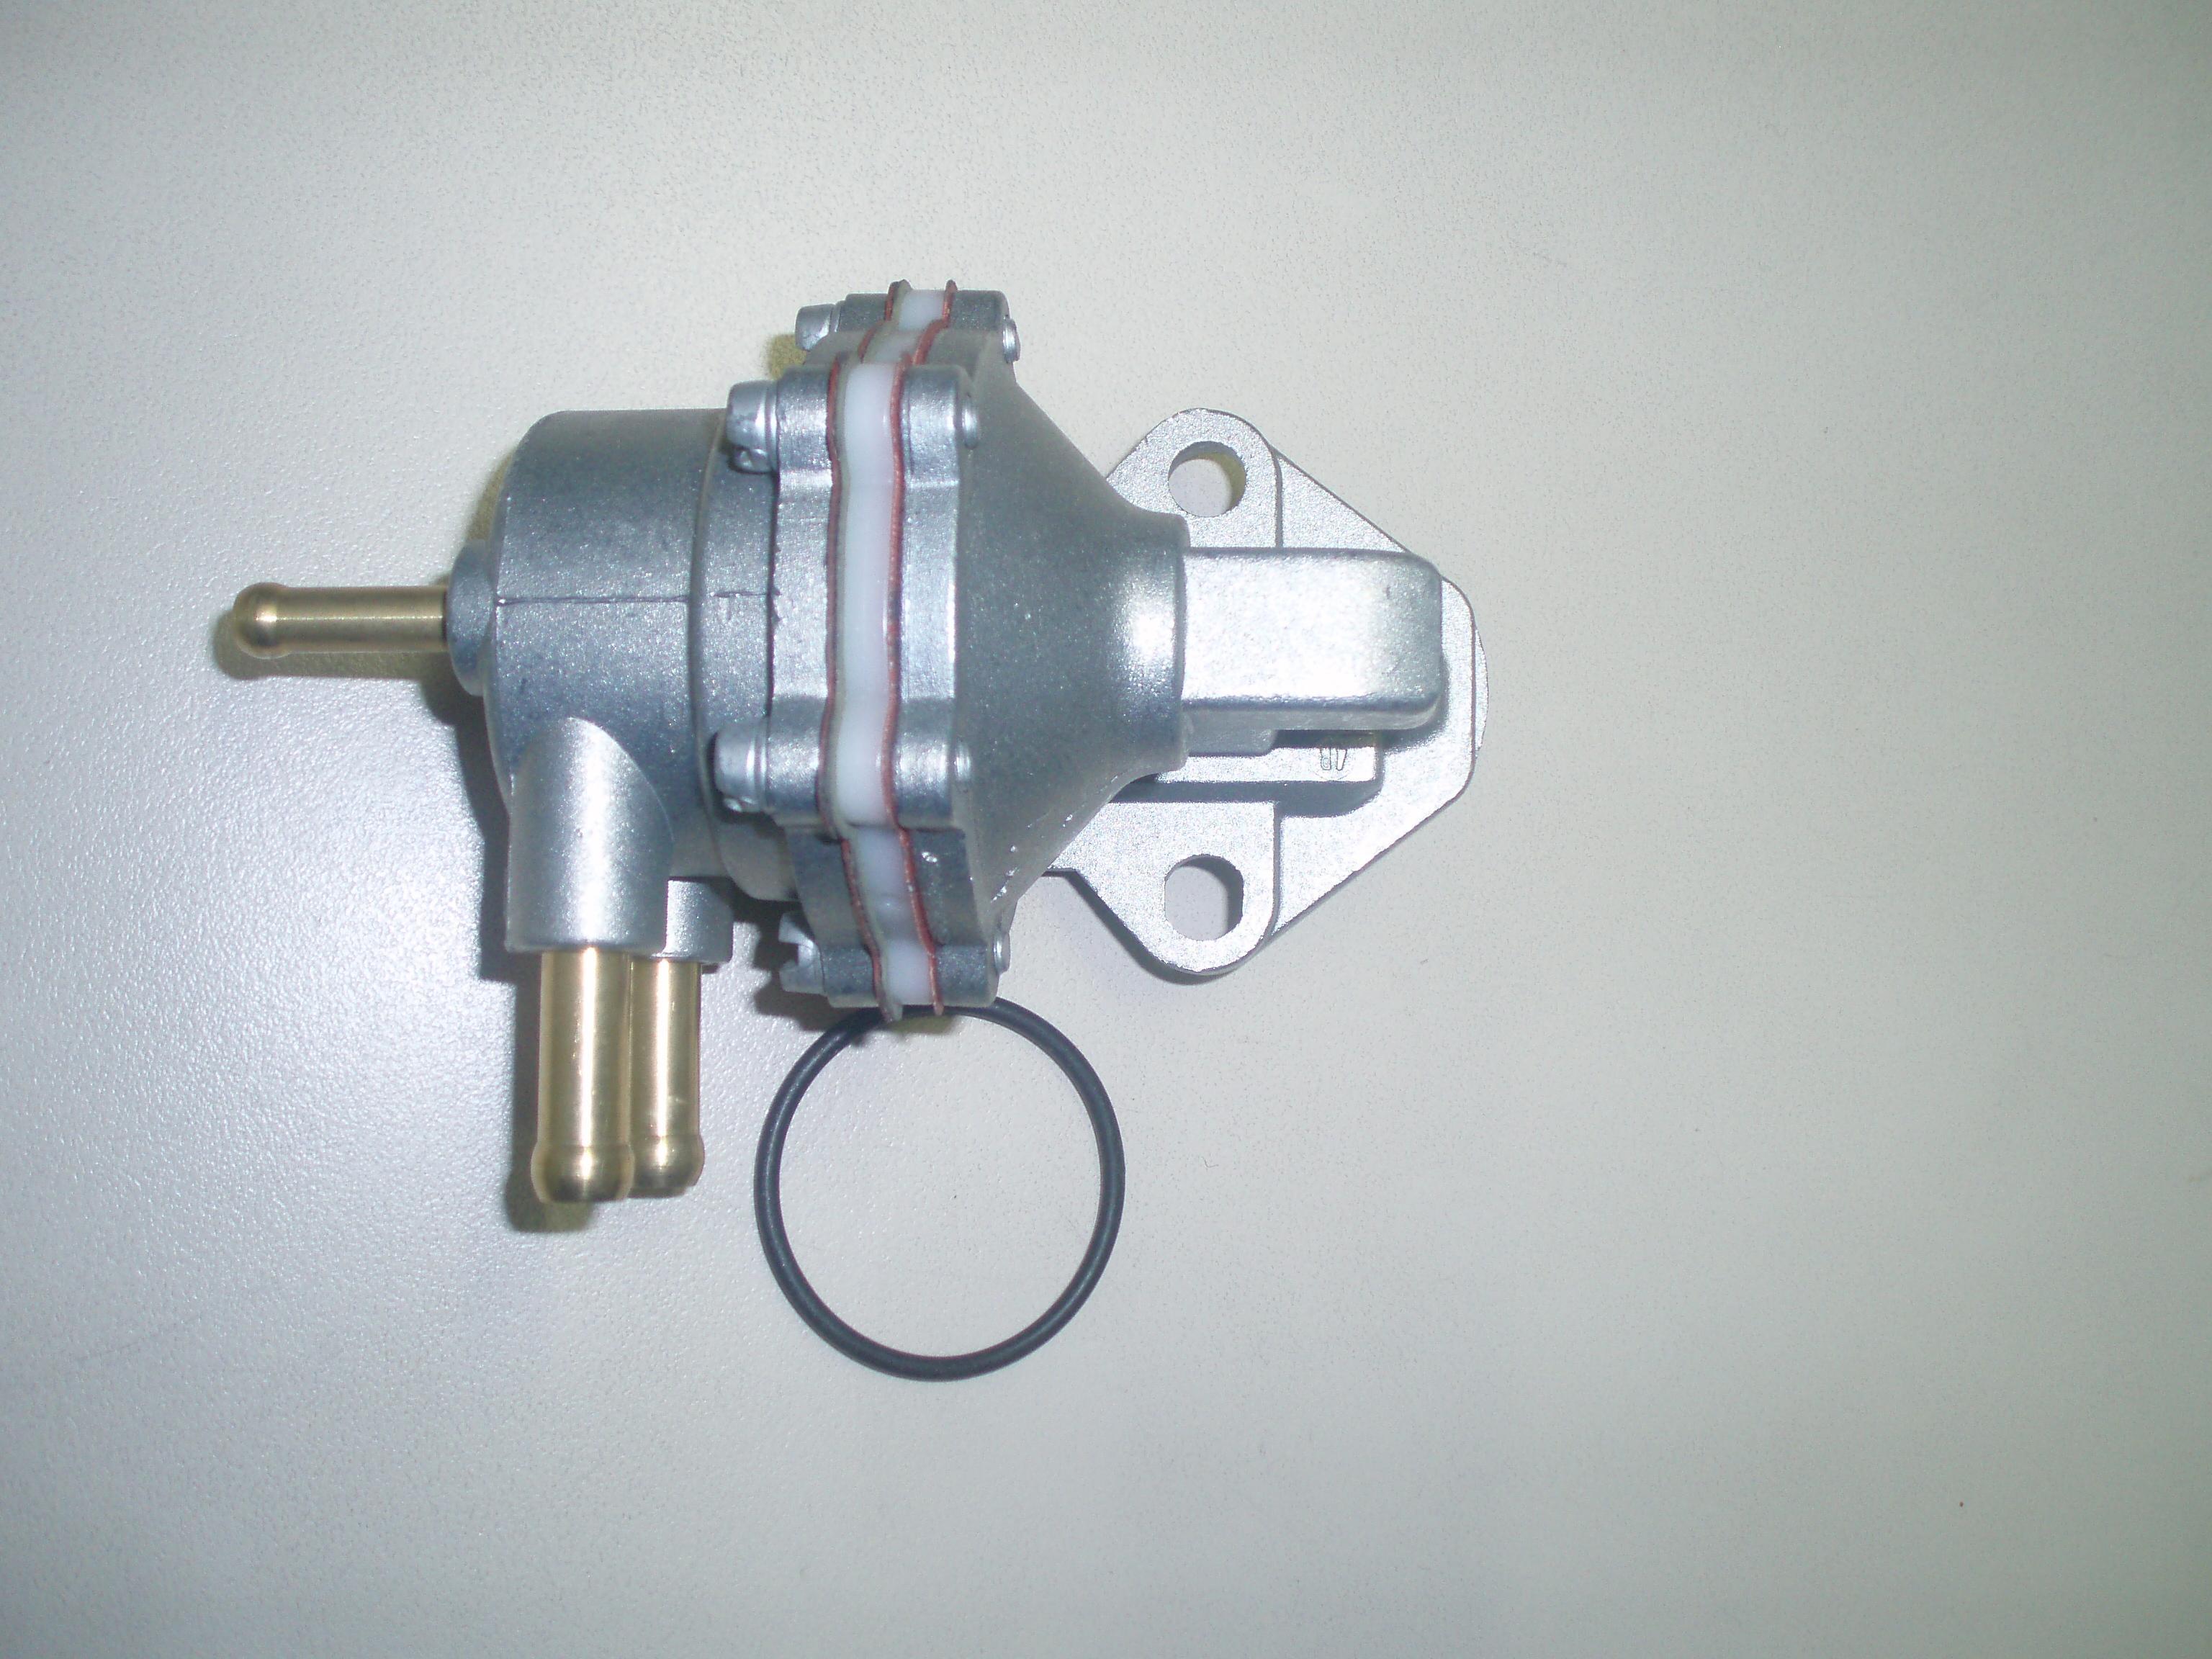 Pompe Essence LGW523 LGW523citycar P/F LGW627 LOMBARDINI 6585070 - BCD 2643/1 KOHLER ED0065850700-S